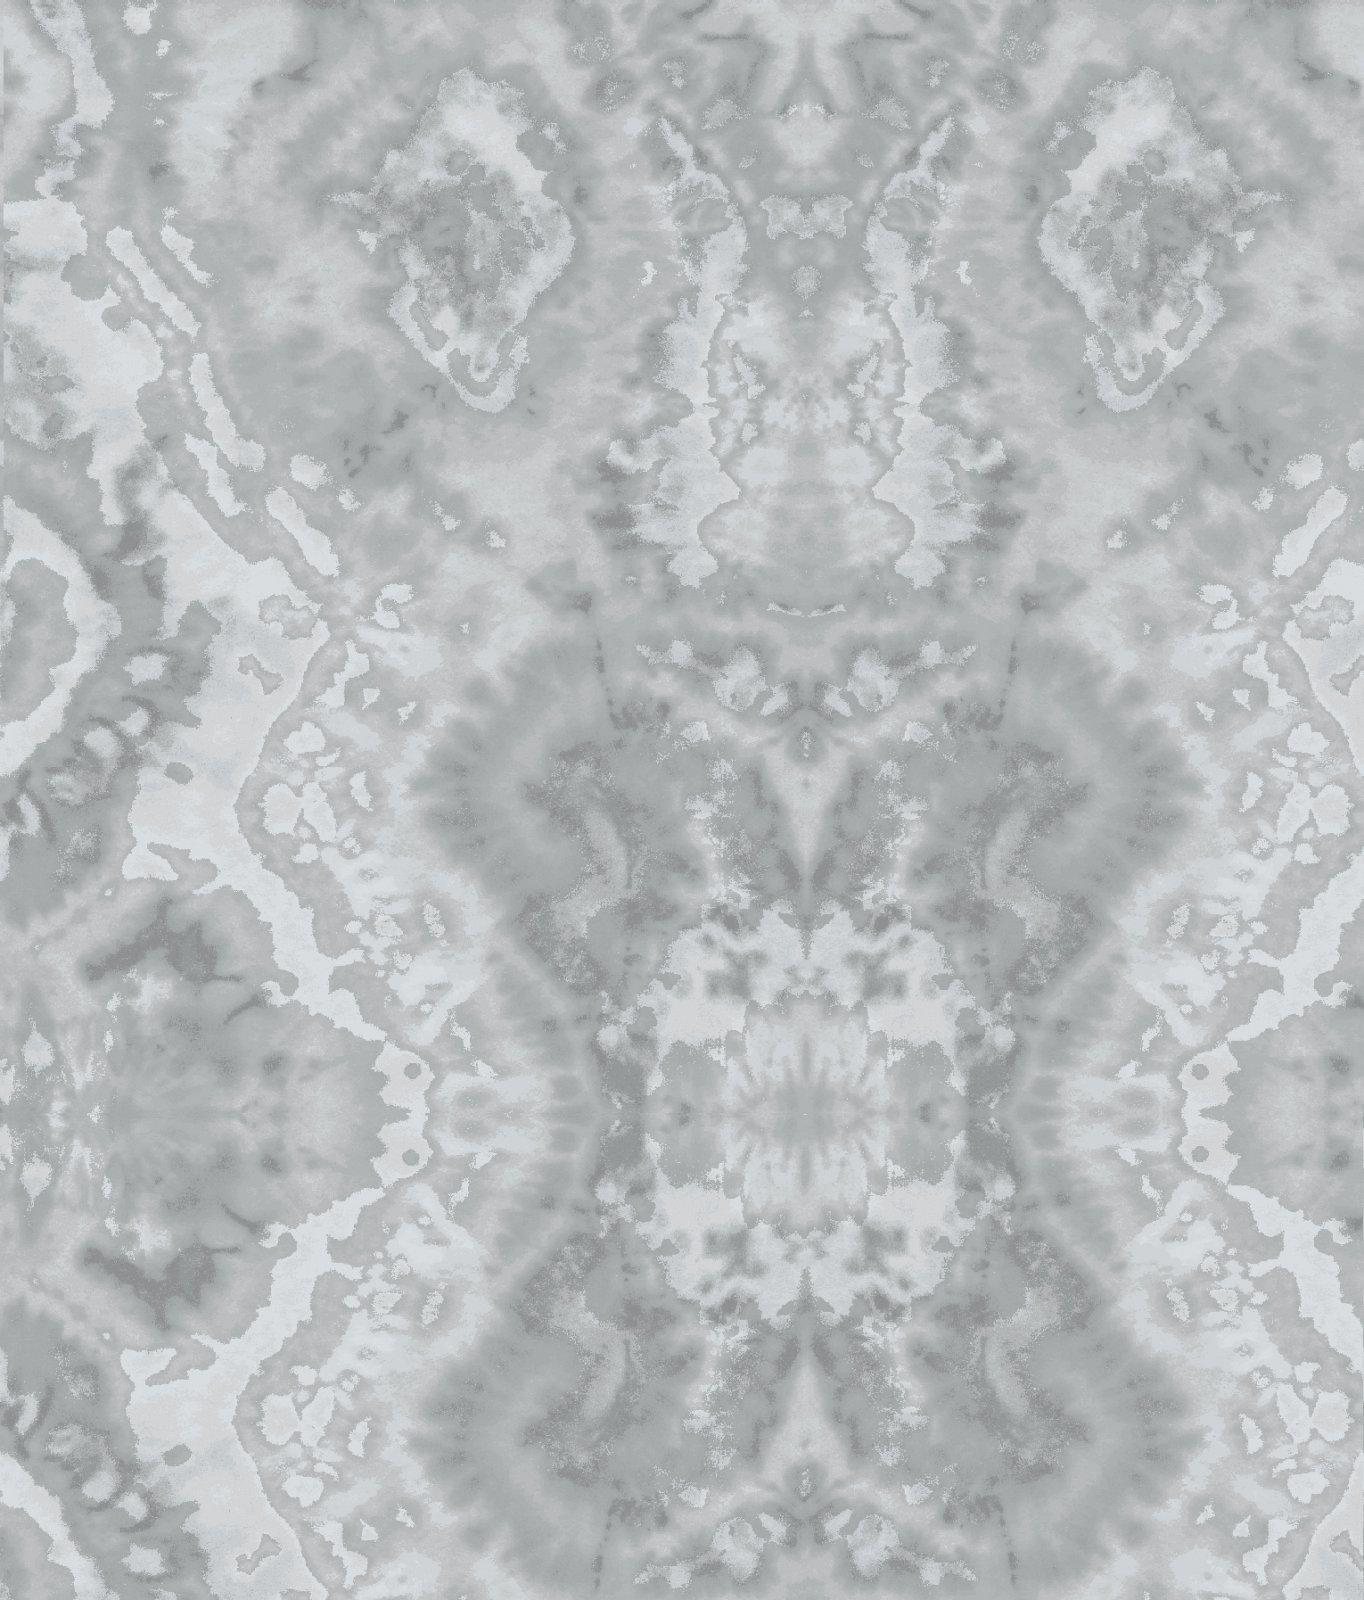 AE-Comfy Flannel Print 9419-999 Grey Blender Flannel